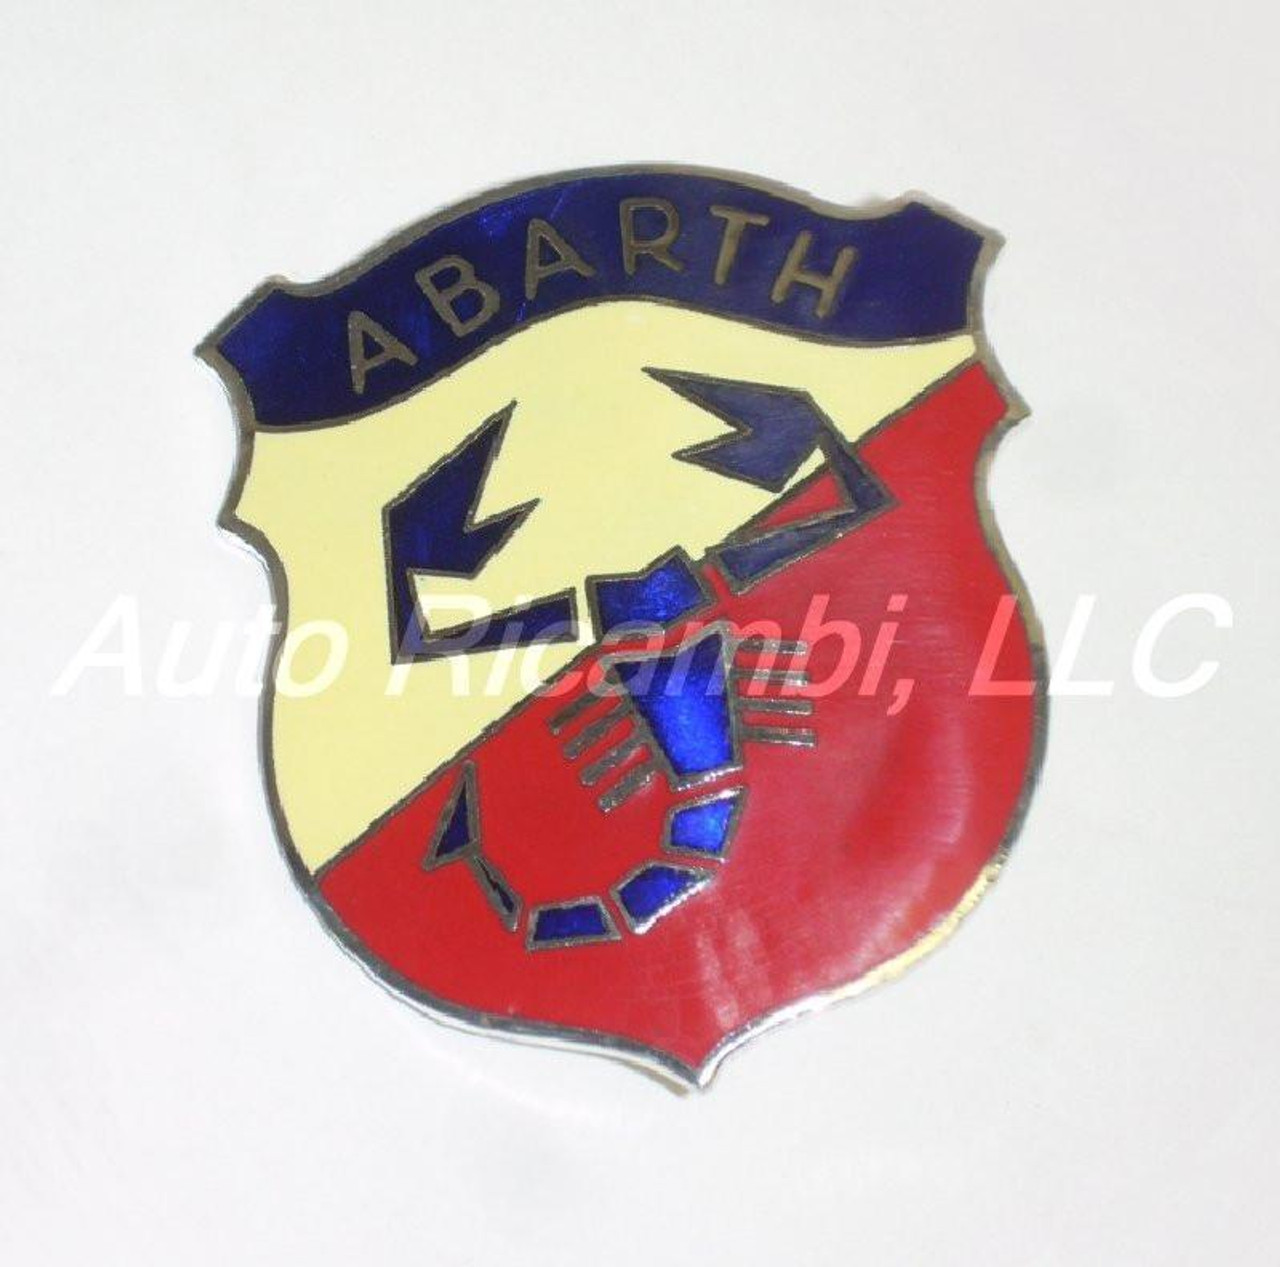 ABARTH Emblem - 70mm